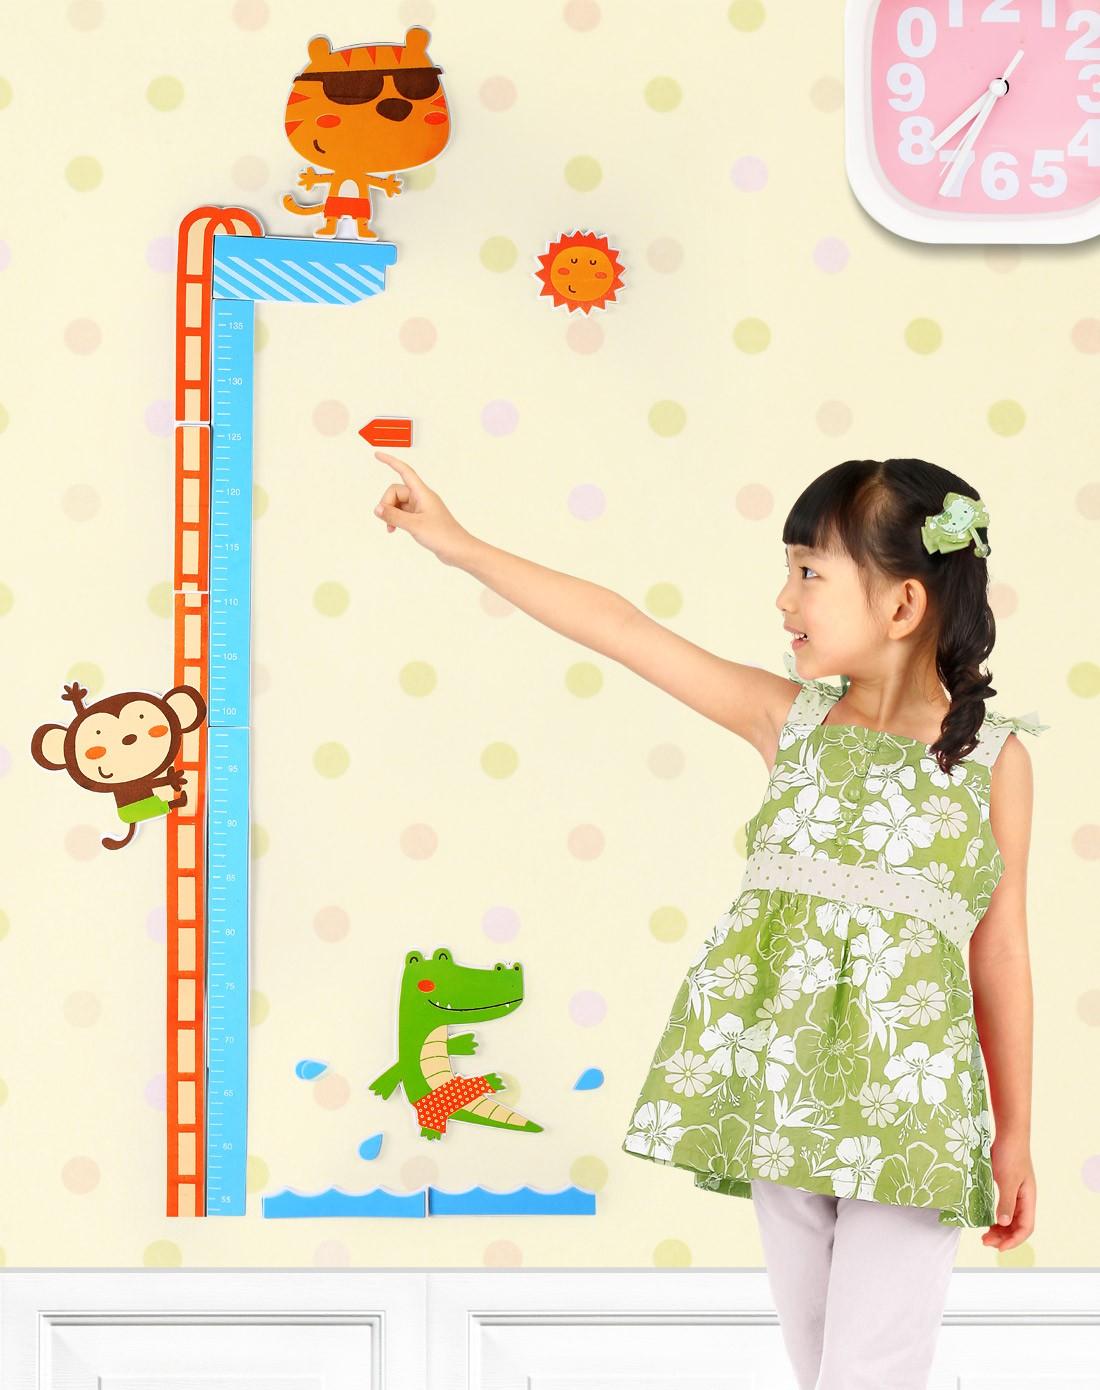 h&3家居用品专场儿童立体量身高尺卡通墙贴动物王国